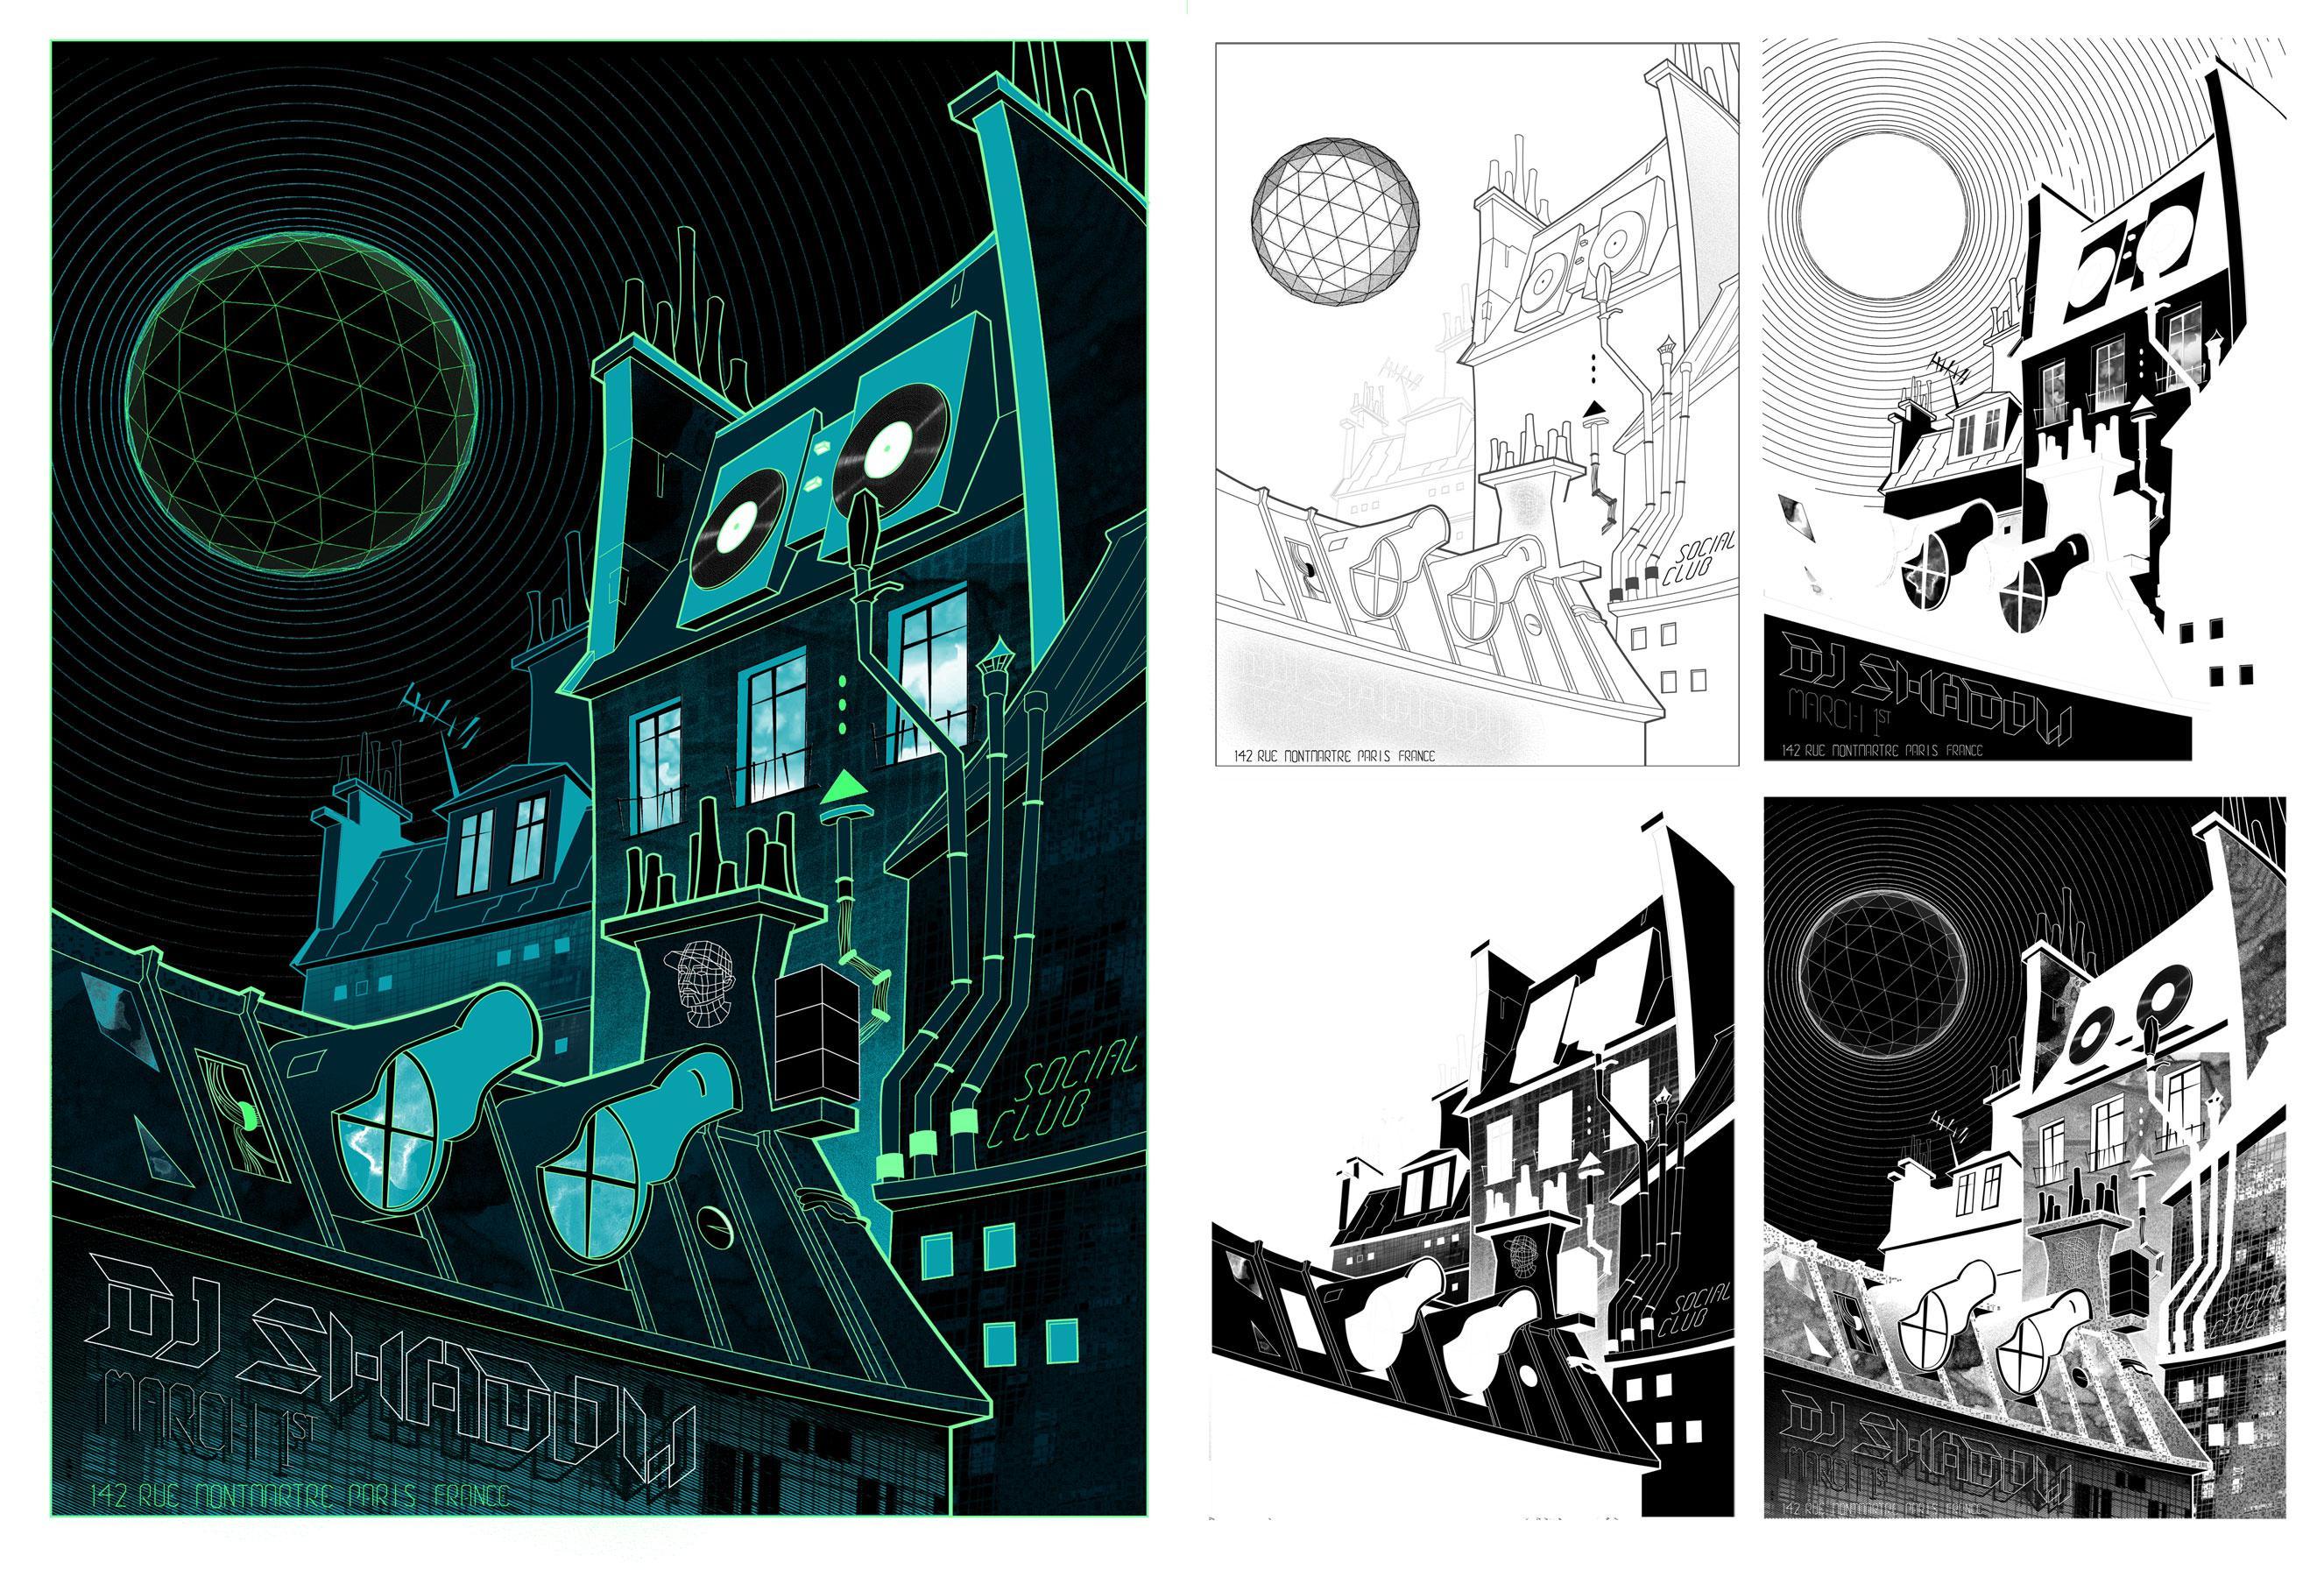 DJ Shadow, March 1st, Social club - Paris, France - image 1 - student project